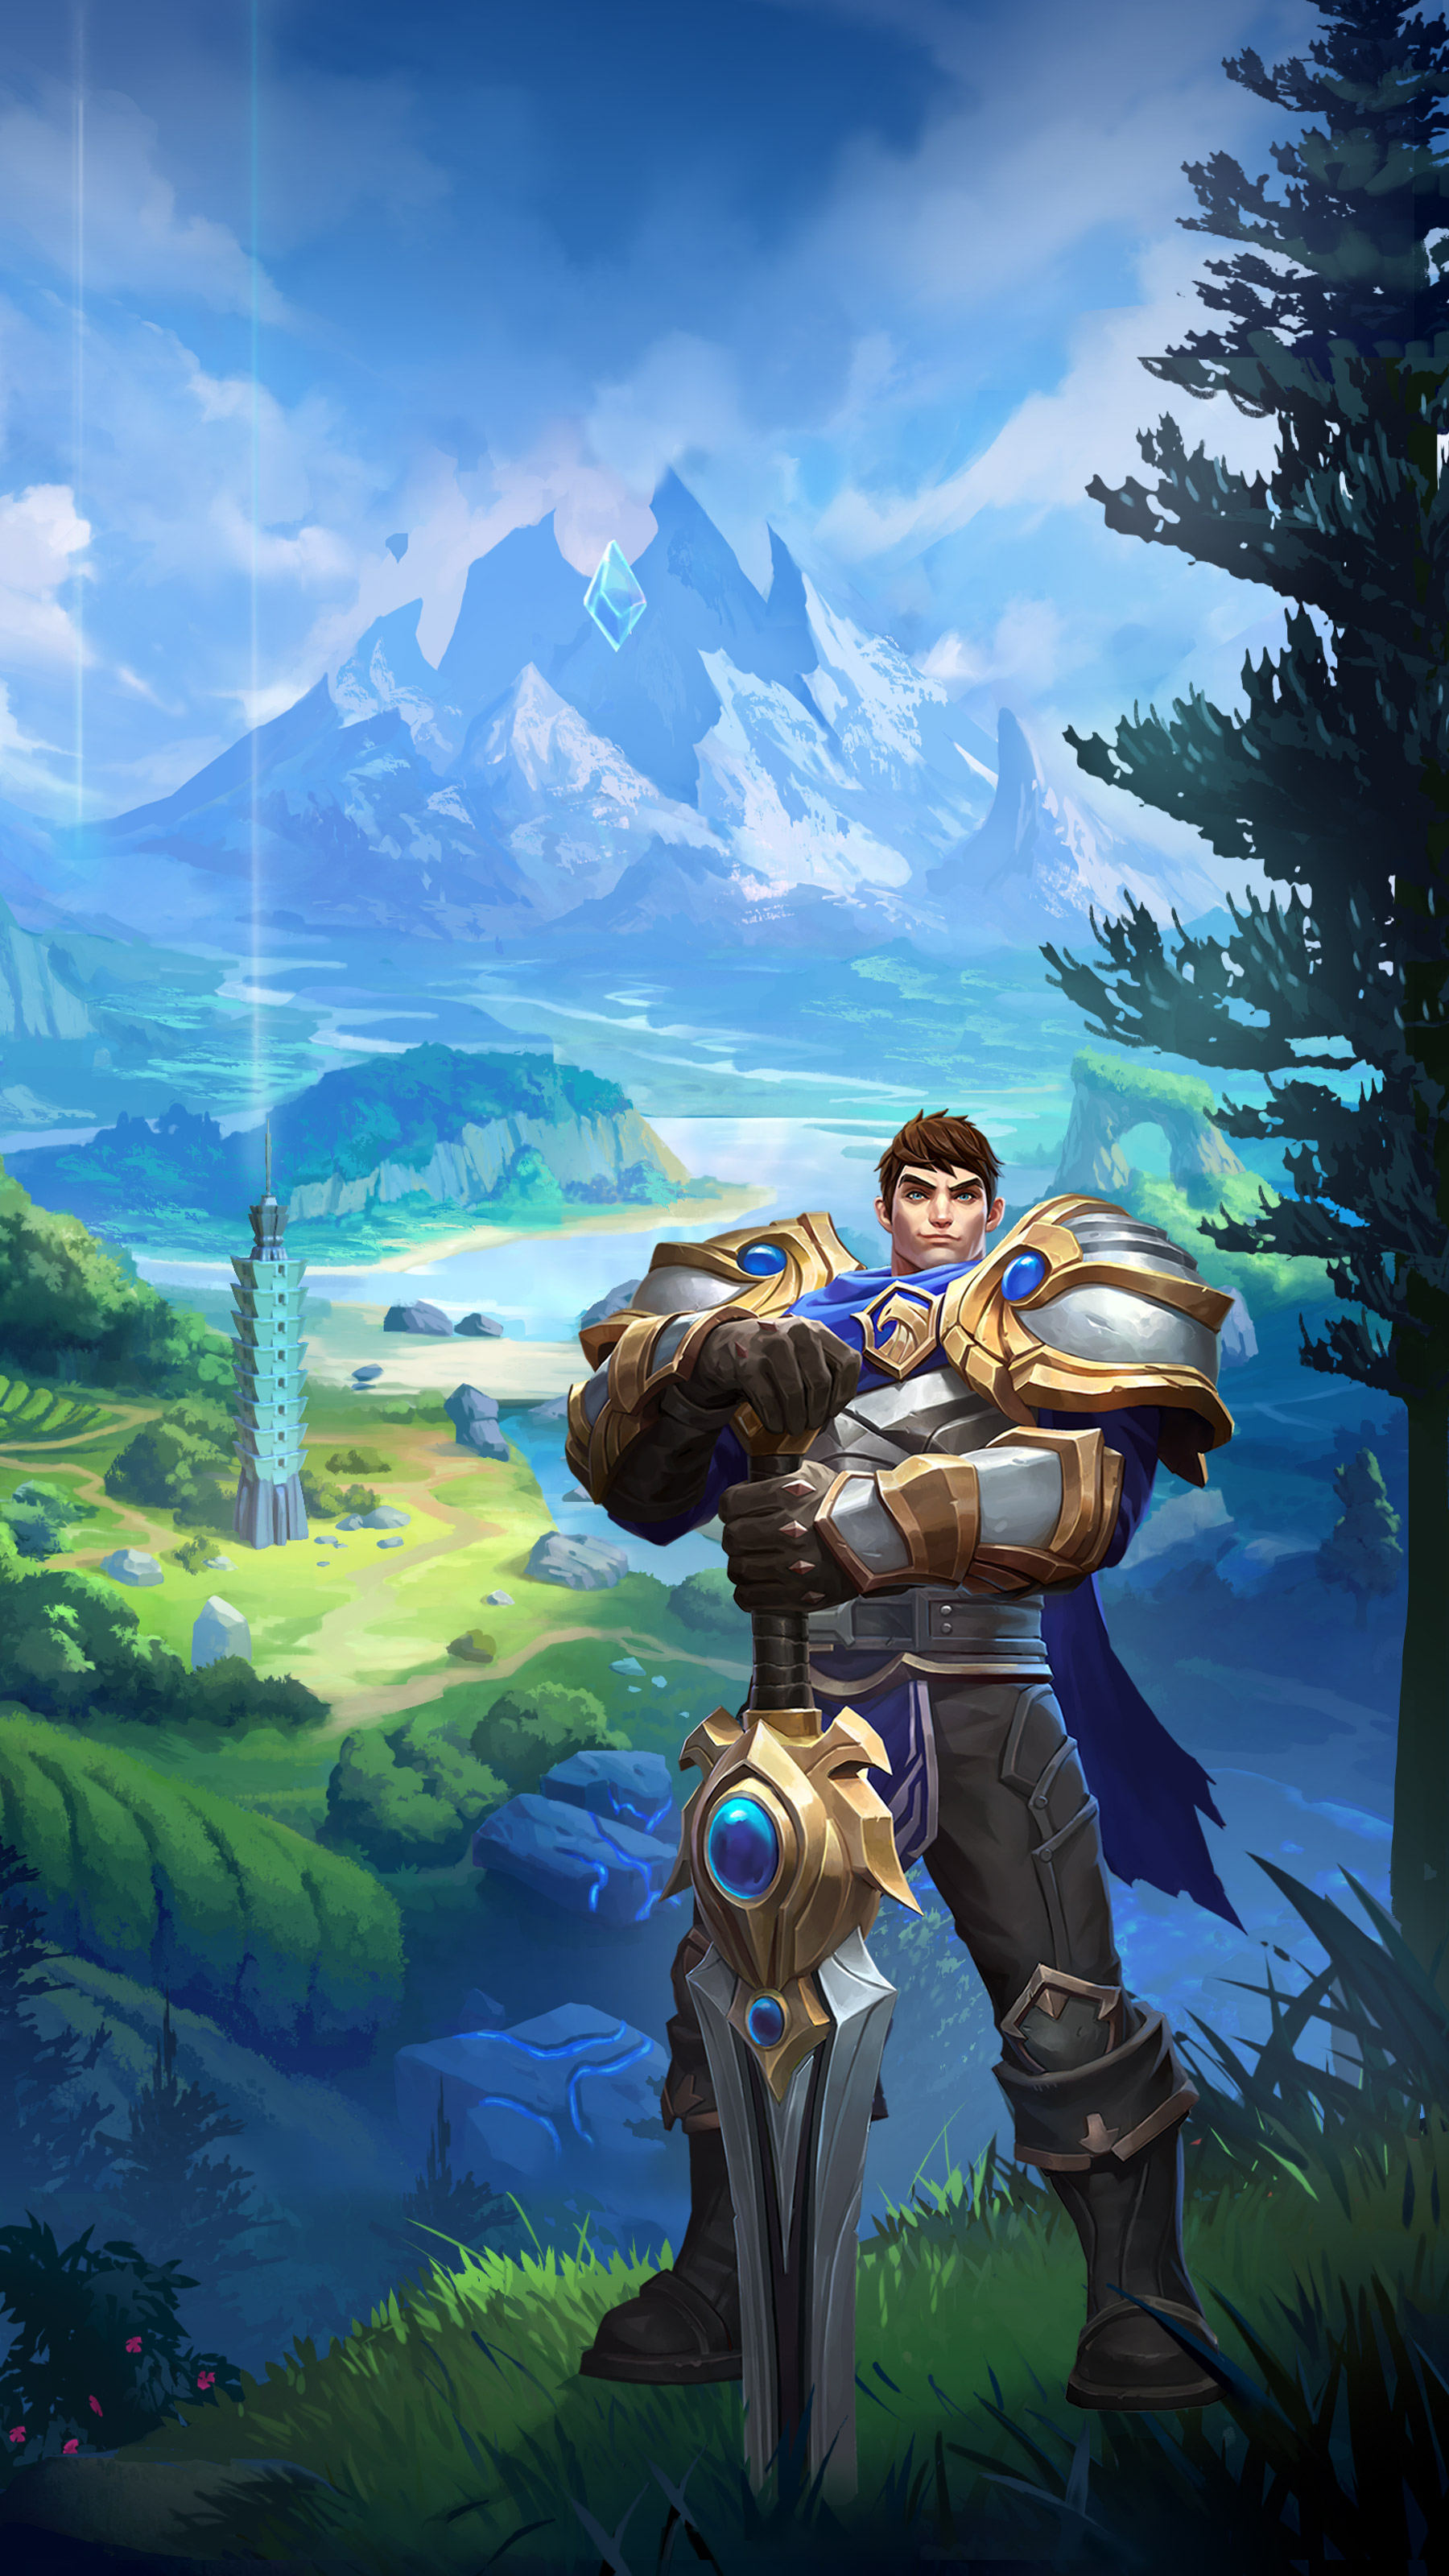 15+ Wallpaper League of Legends: Wild Rift Untuk PC dan Hp 2